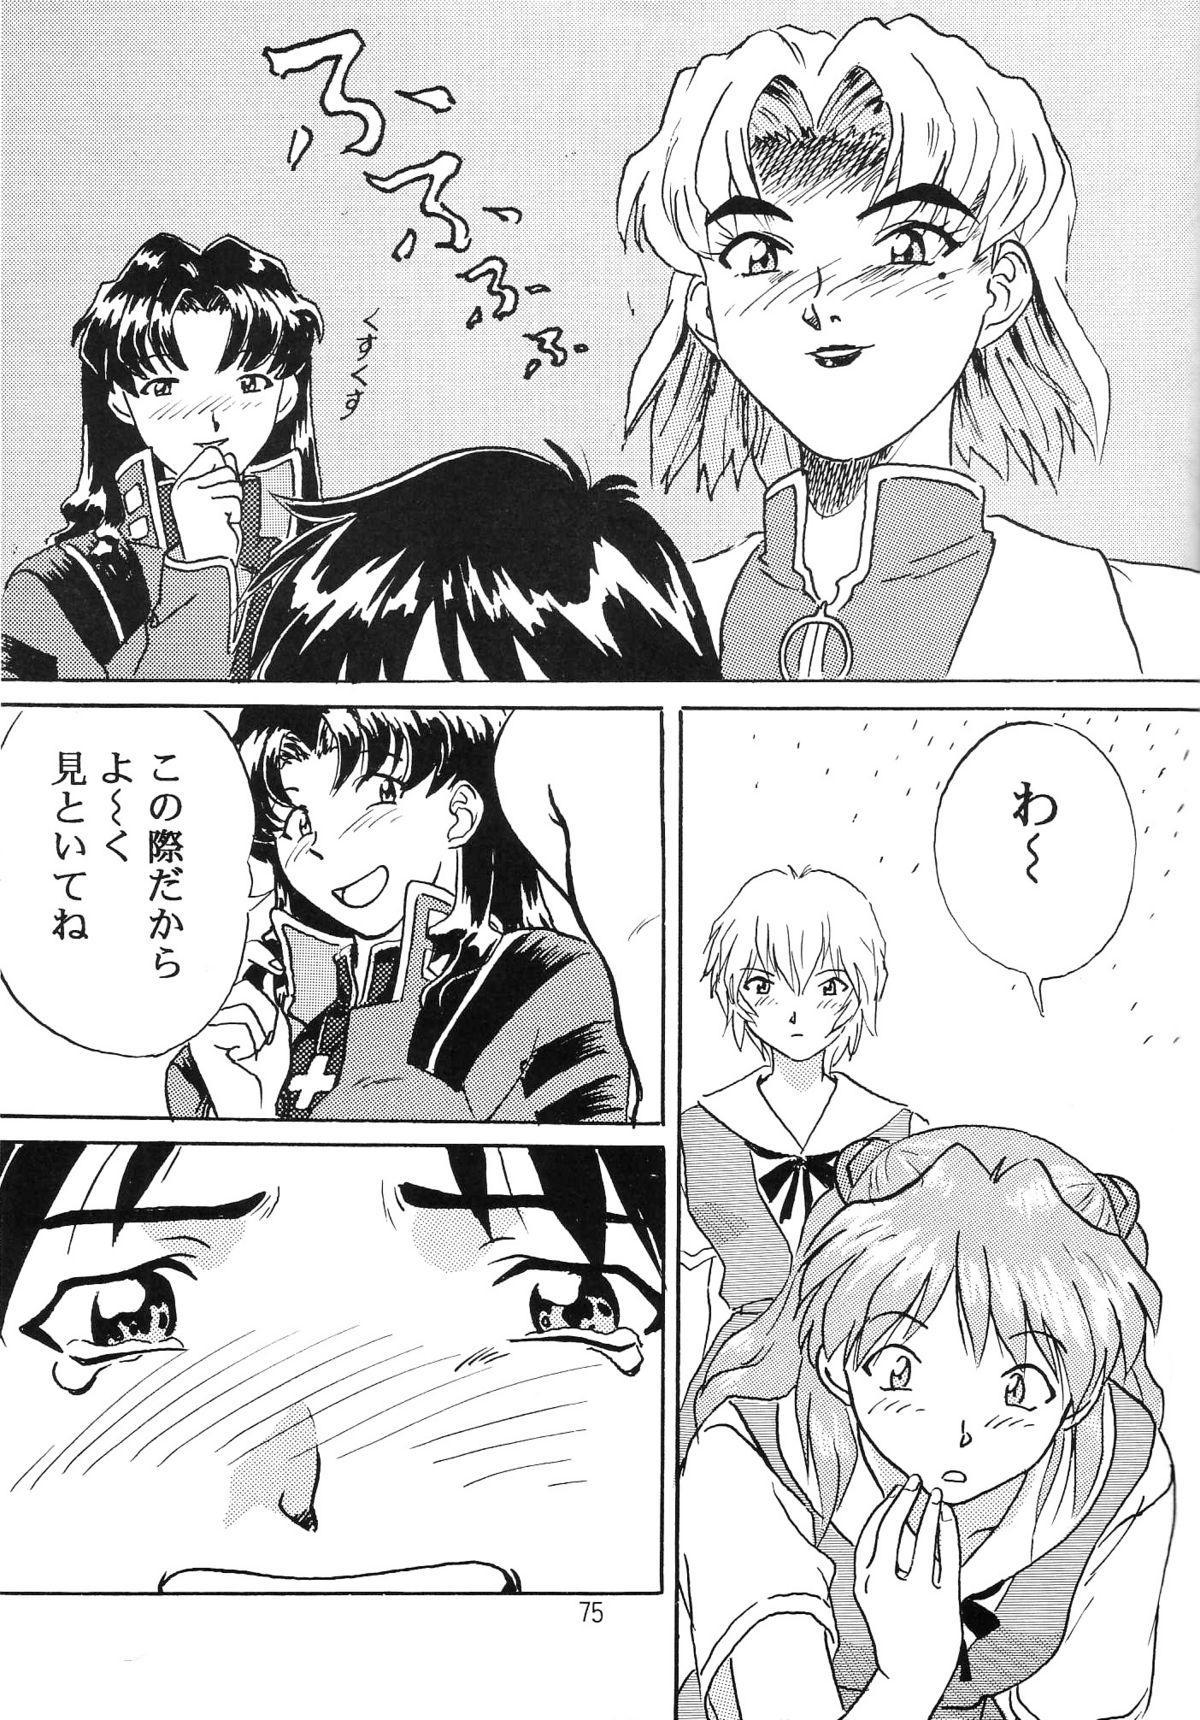 Hen Rei Kai Special Vol. 9 76